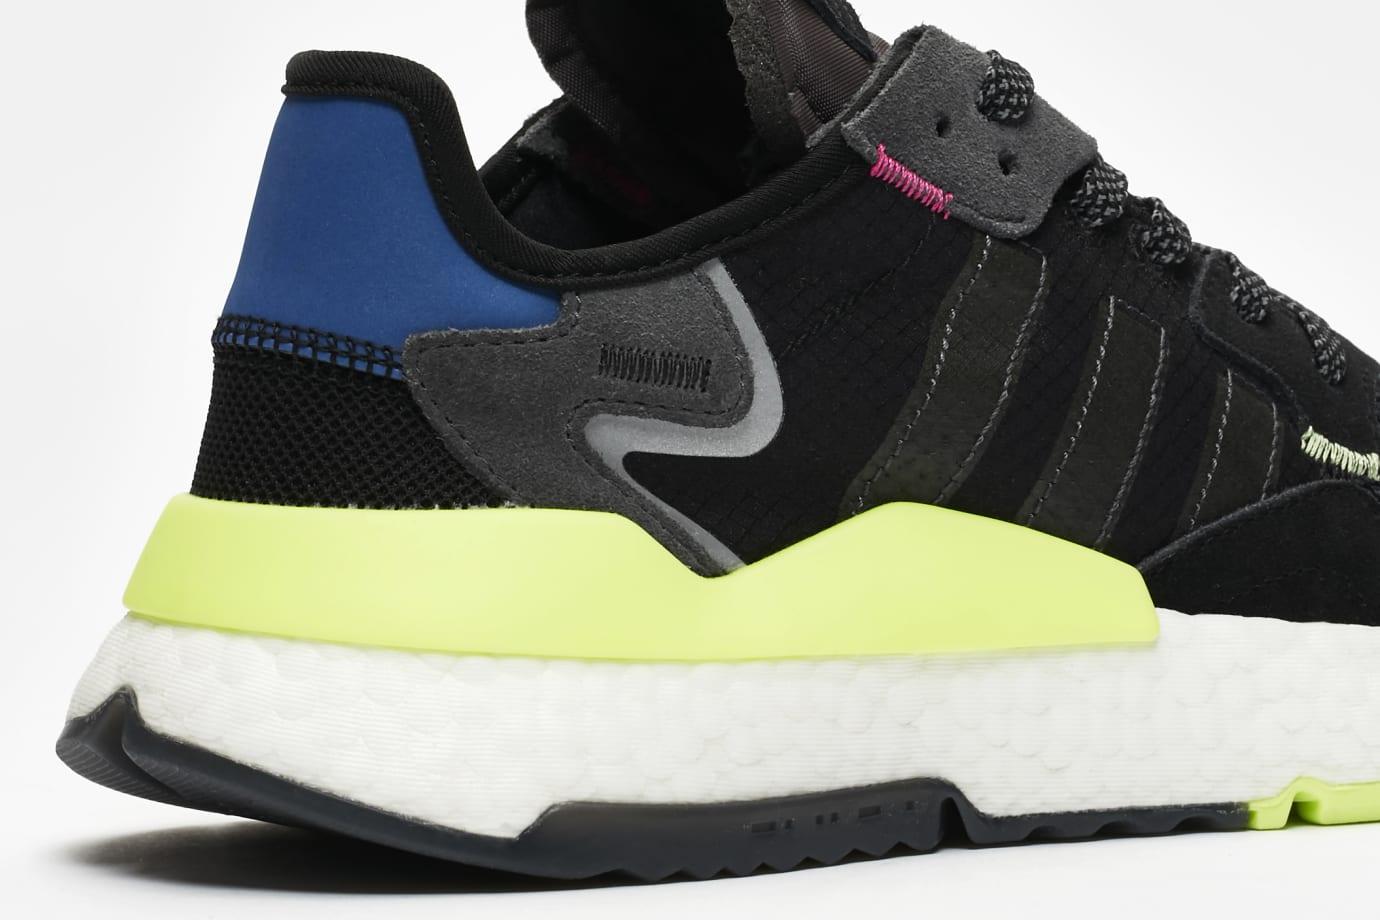 SNS x Adidas Nite Jogger 'Black/Carbon-Grey Six' EE9462 (Detail 2)